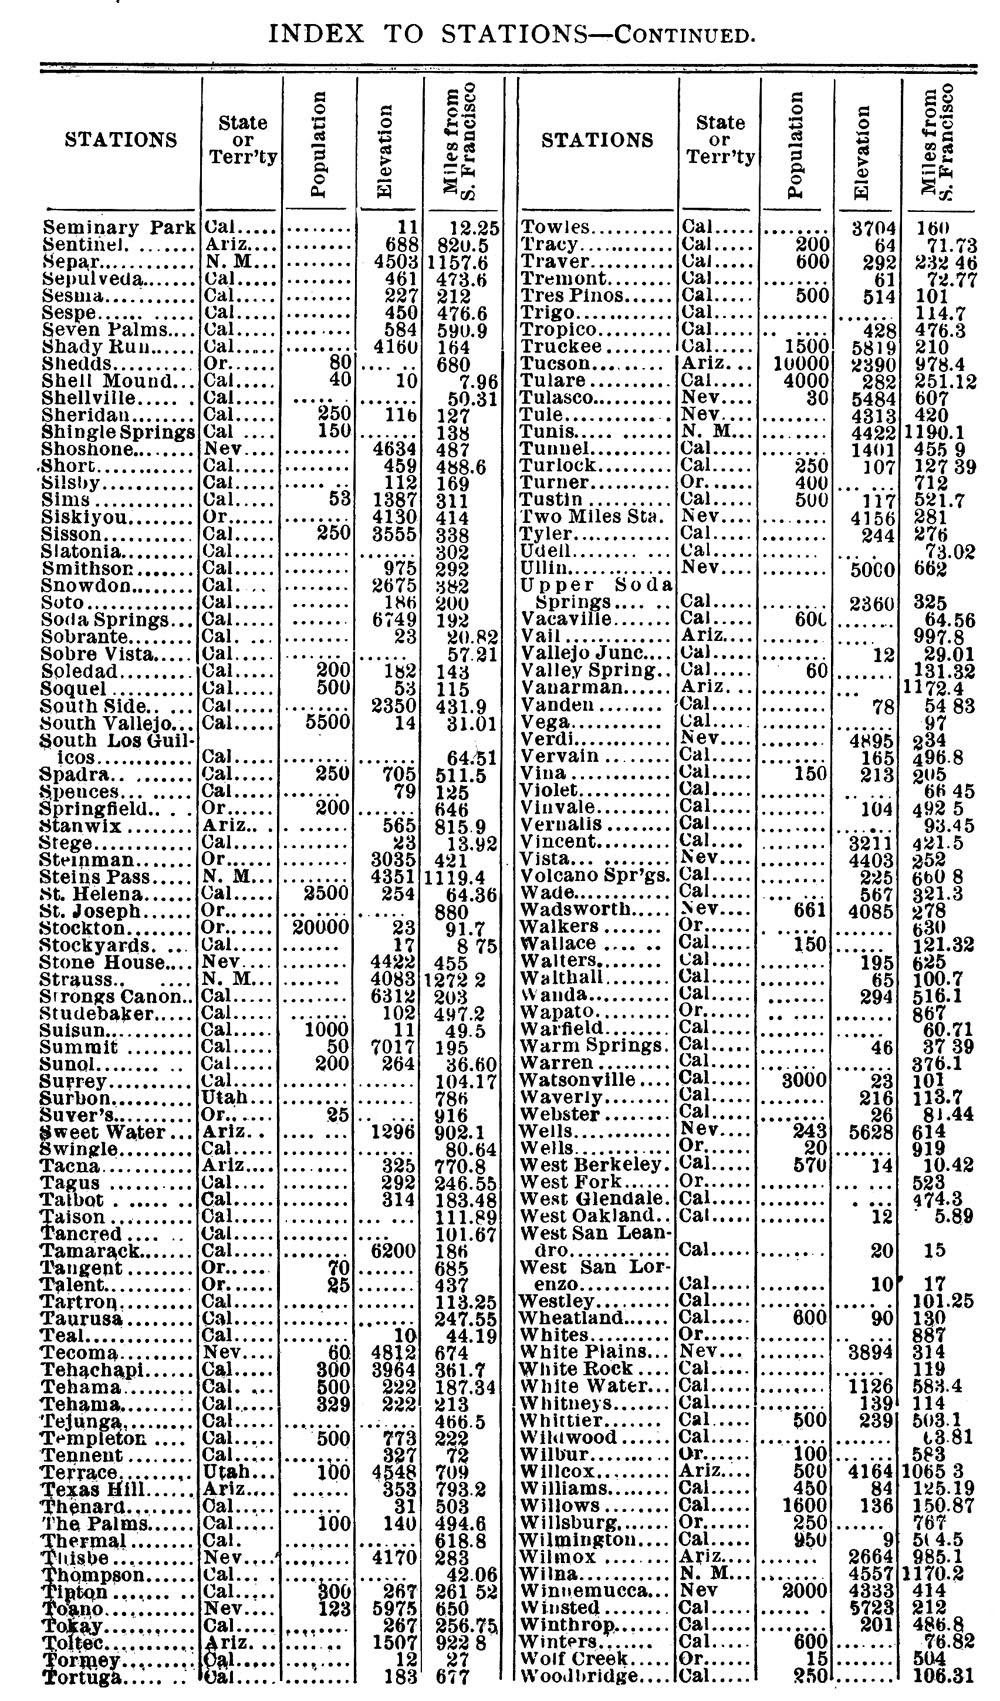 SPRR Stations, 1889